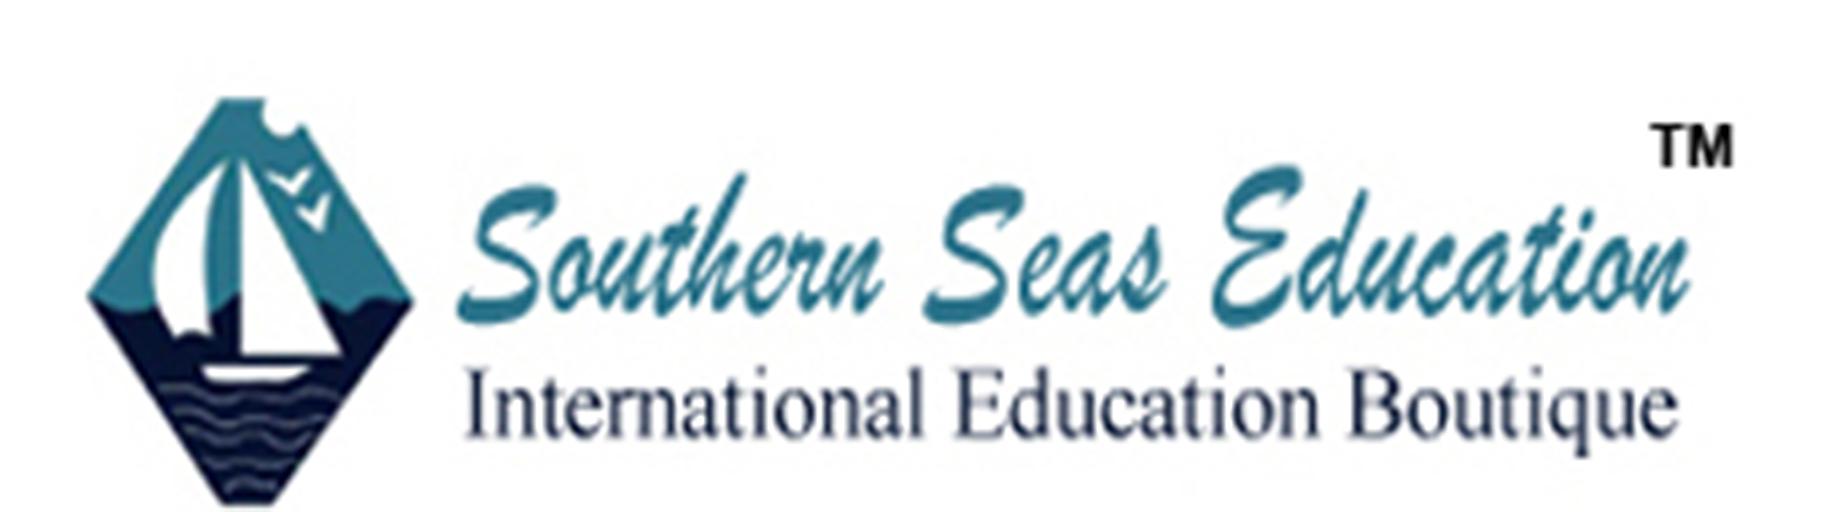 Southernseas Education